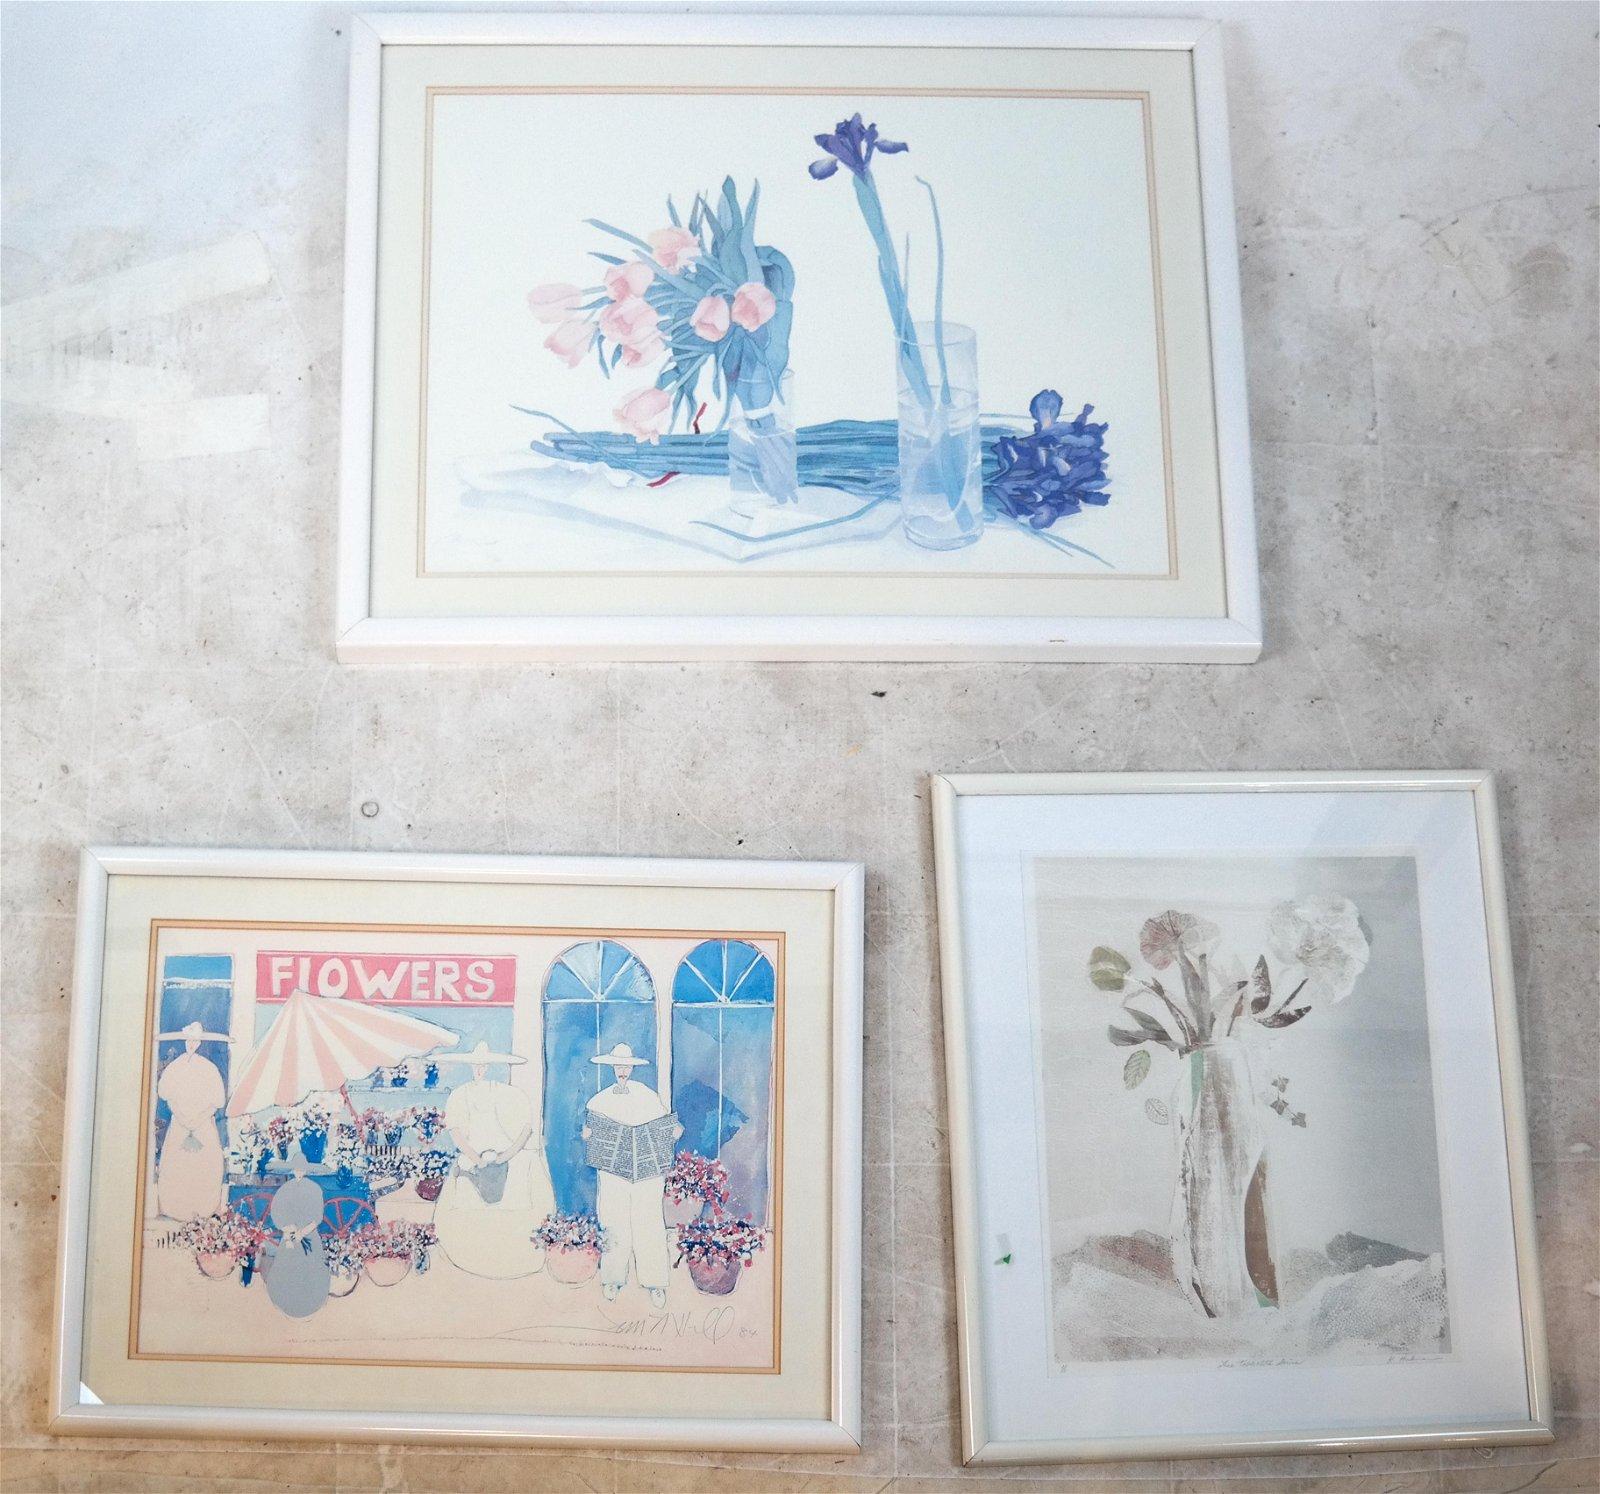 K. HOCKMAN, Others: 3 Still Lifes - Prints